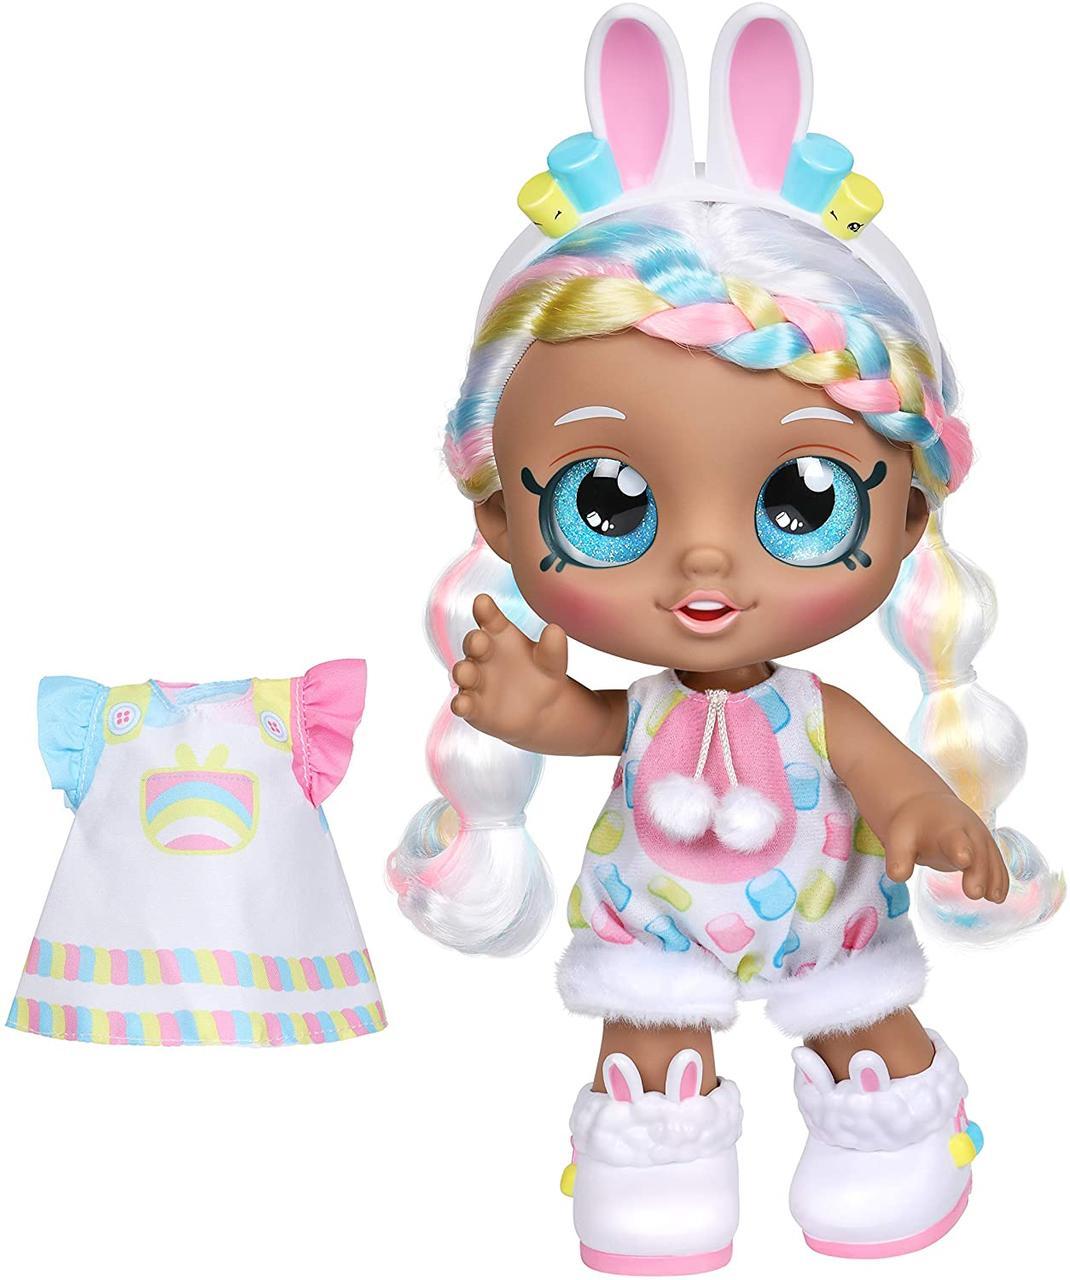 Кукла Кинди Кидс Марша Мелло Moose Toys Kindi Kids Dress Up Friends Marsha Mello Bunny